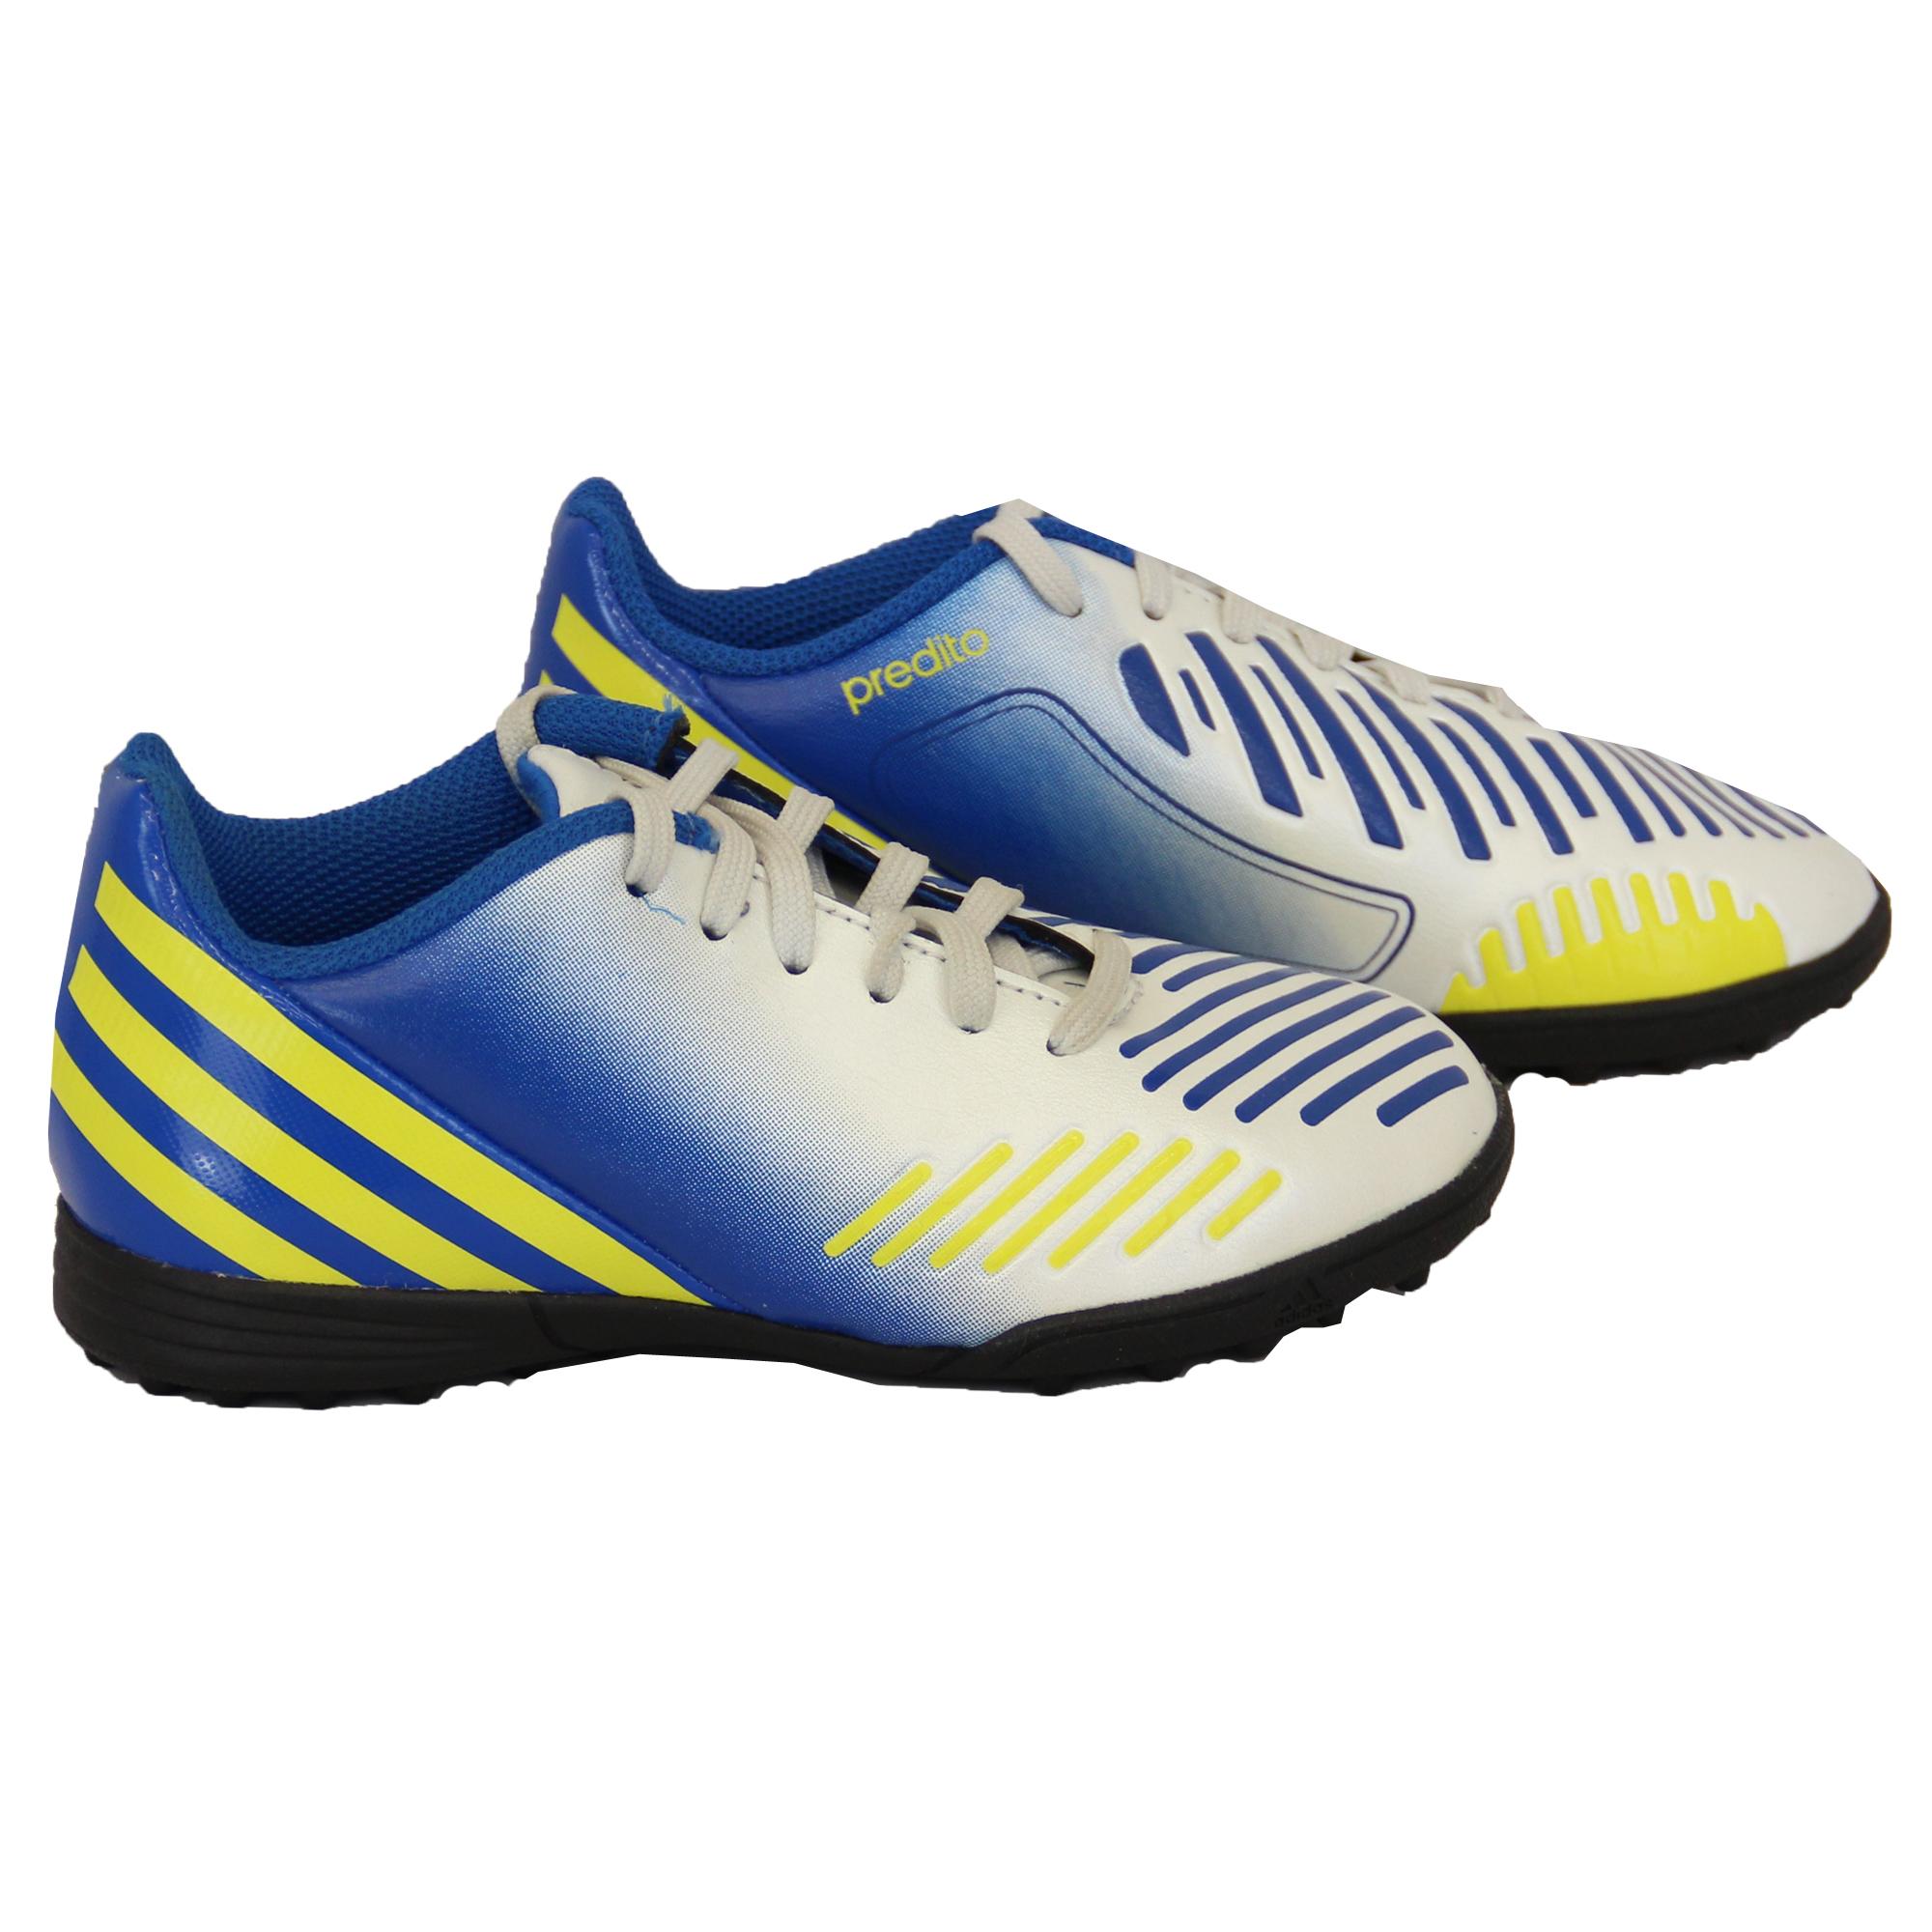 Adidas Nitrocharge Indoor Shoes